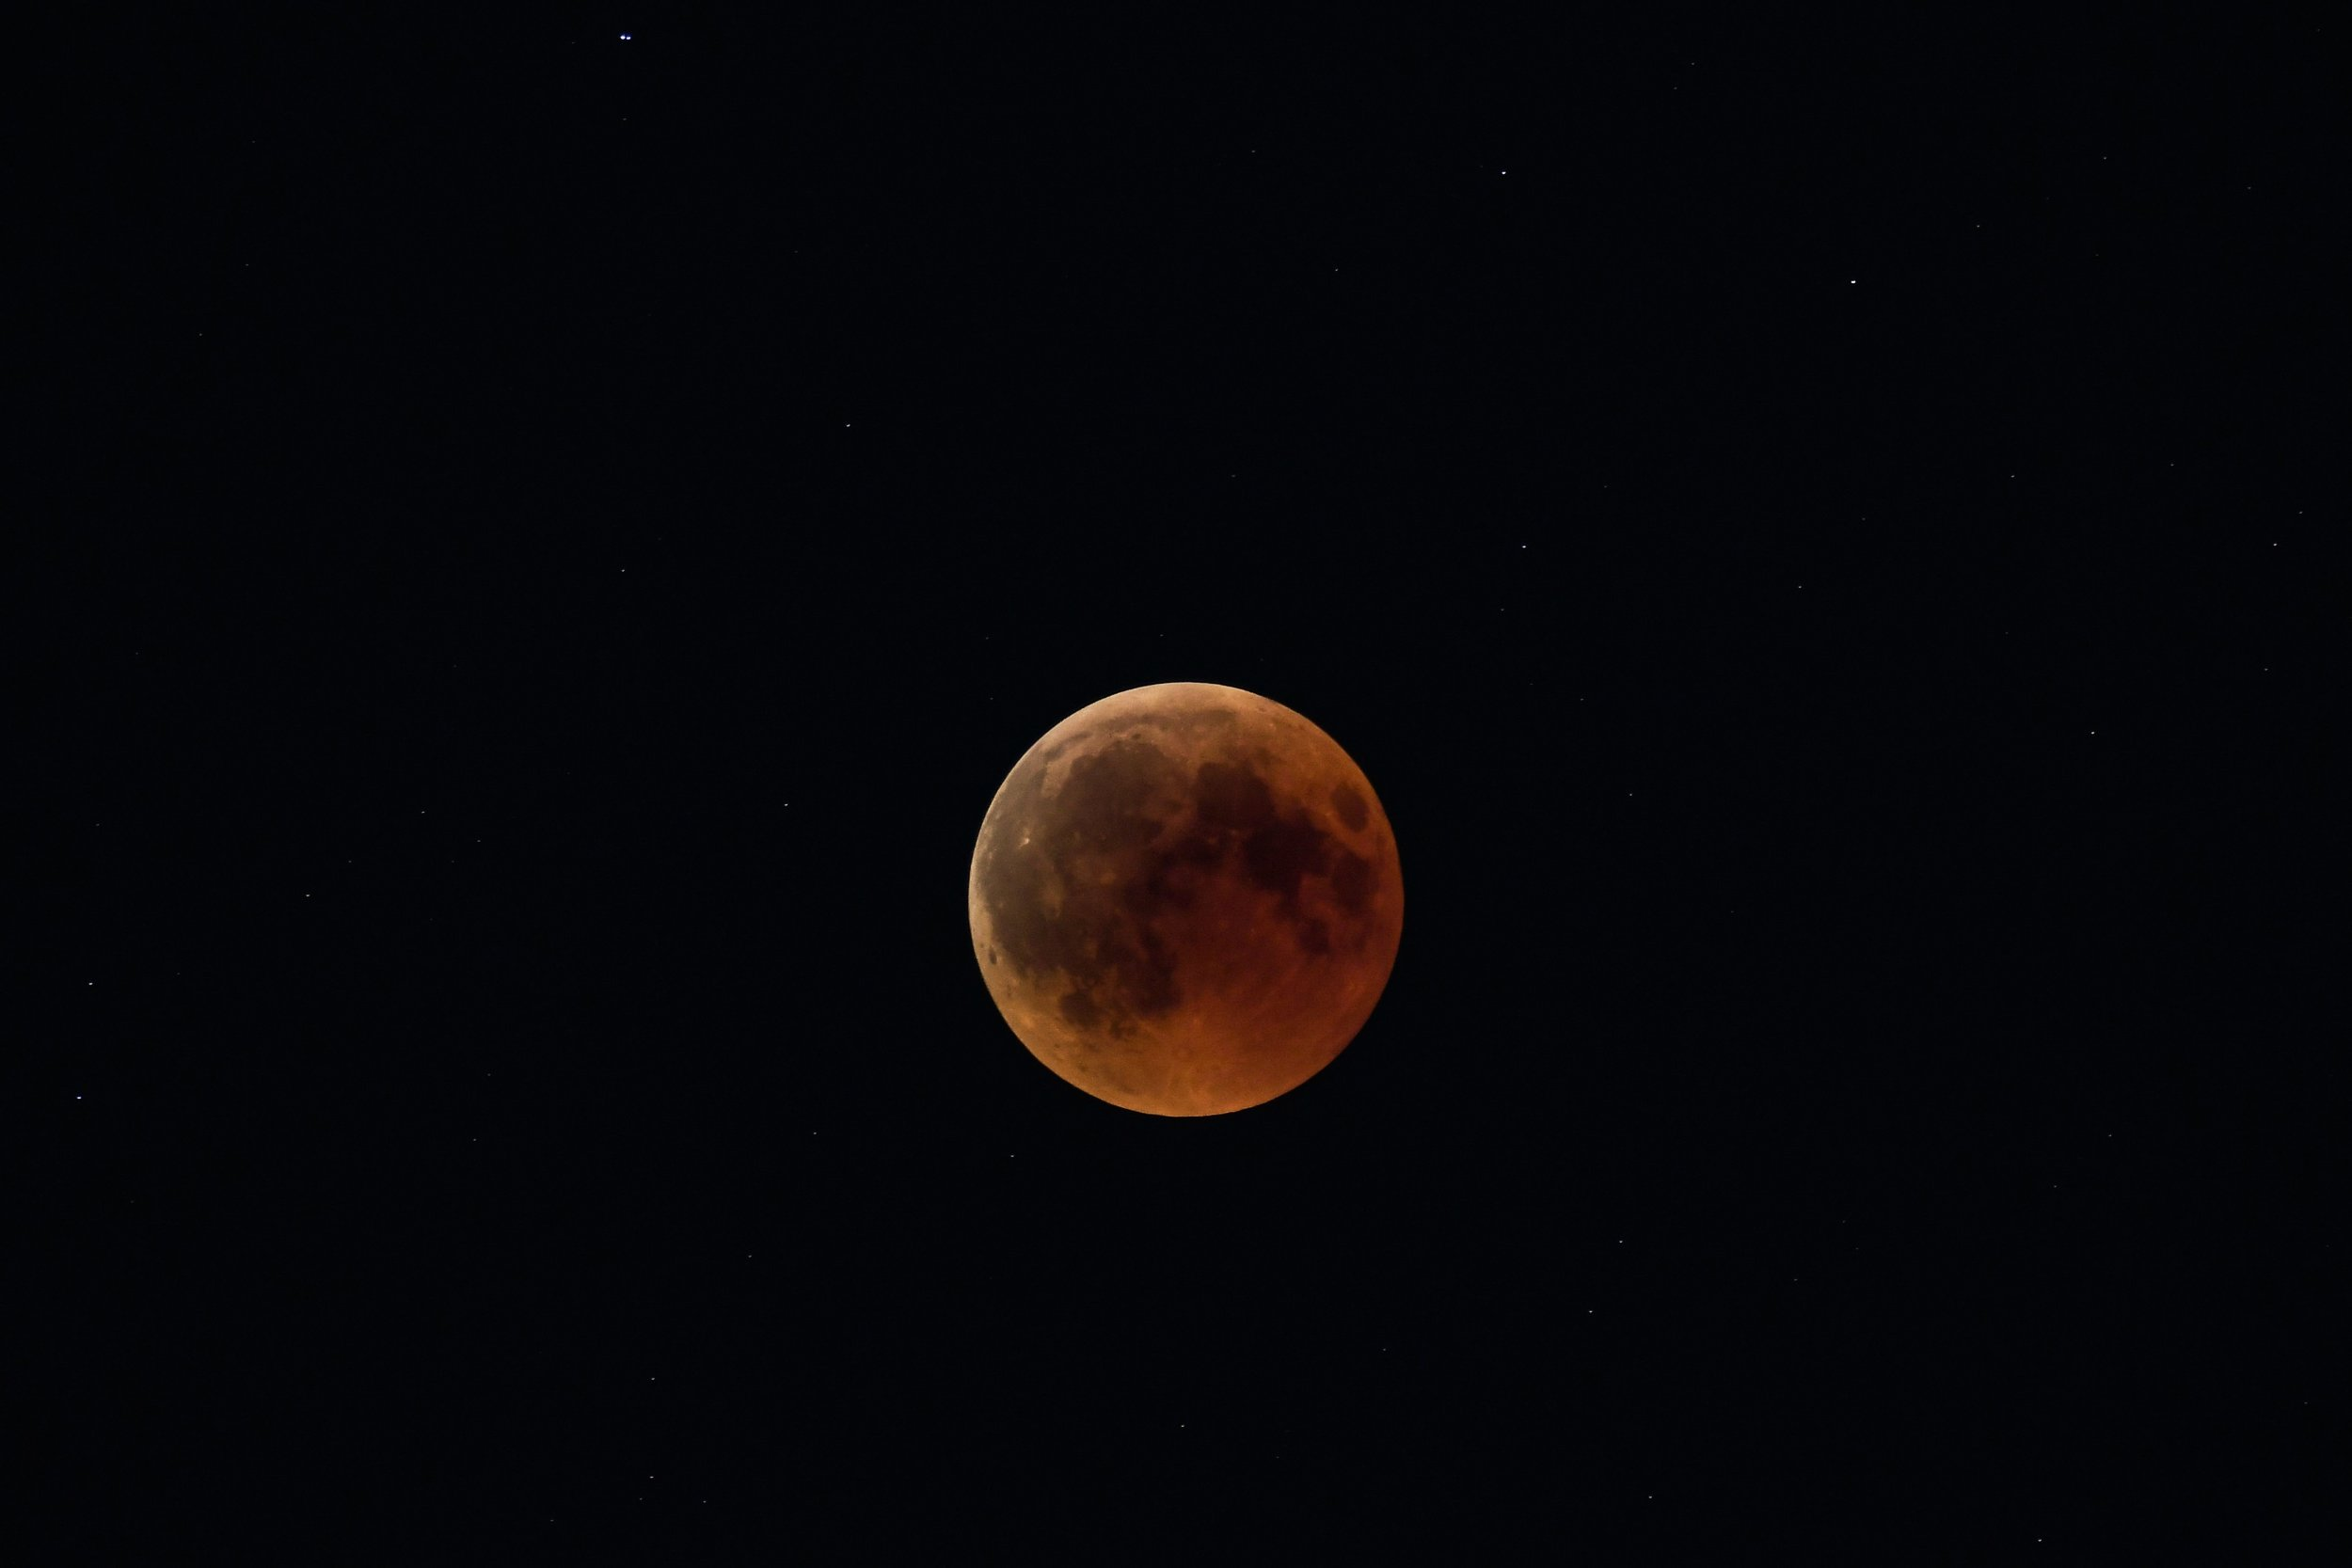 blood moon january 2019 live feed - photo #11